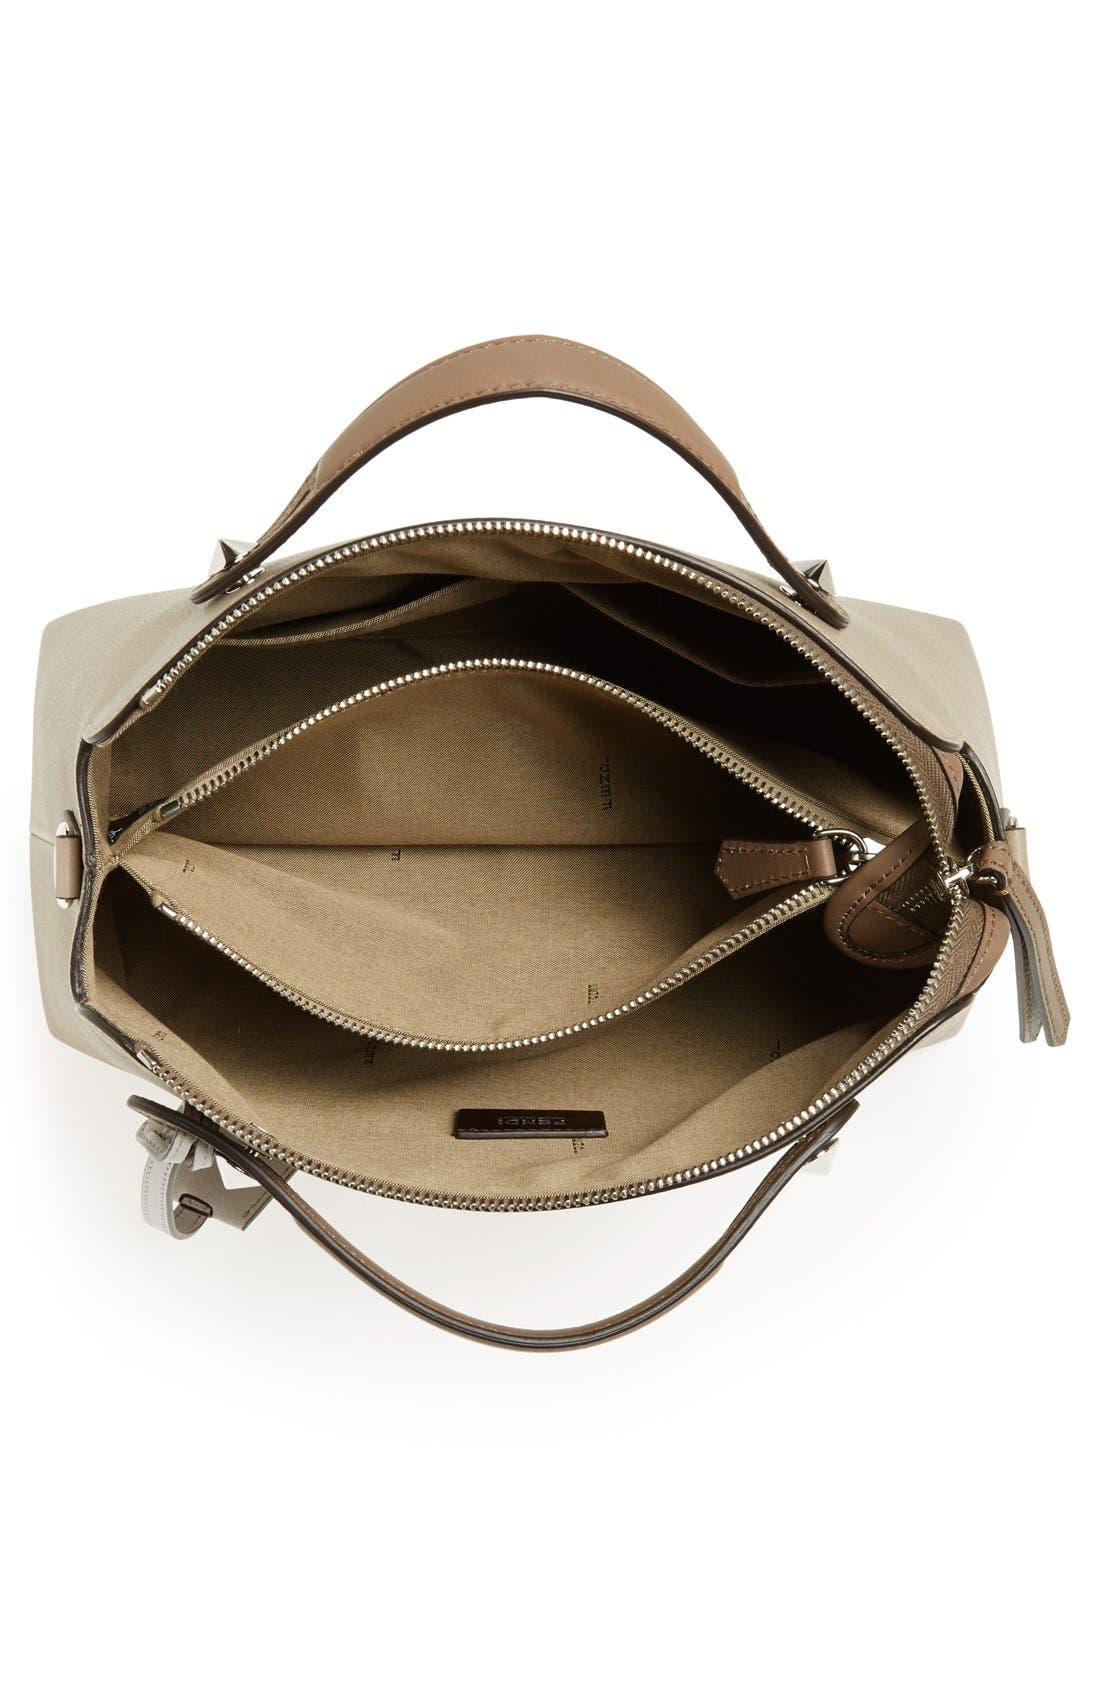 'Bauletto Piccolo' Leather Crossbody Bag,                             Alternate thumbnail 3, color,                             Turtledv Sepia Palladuim